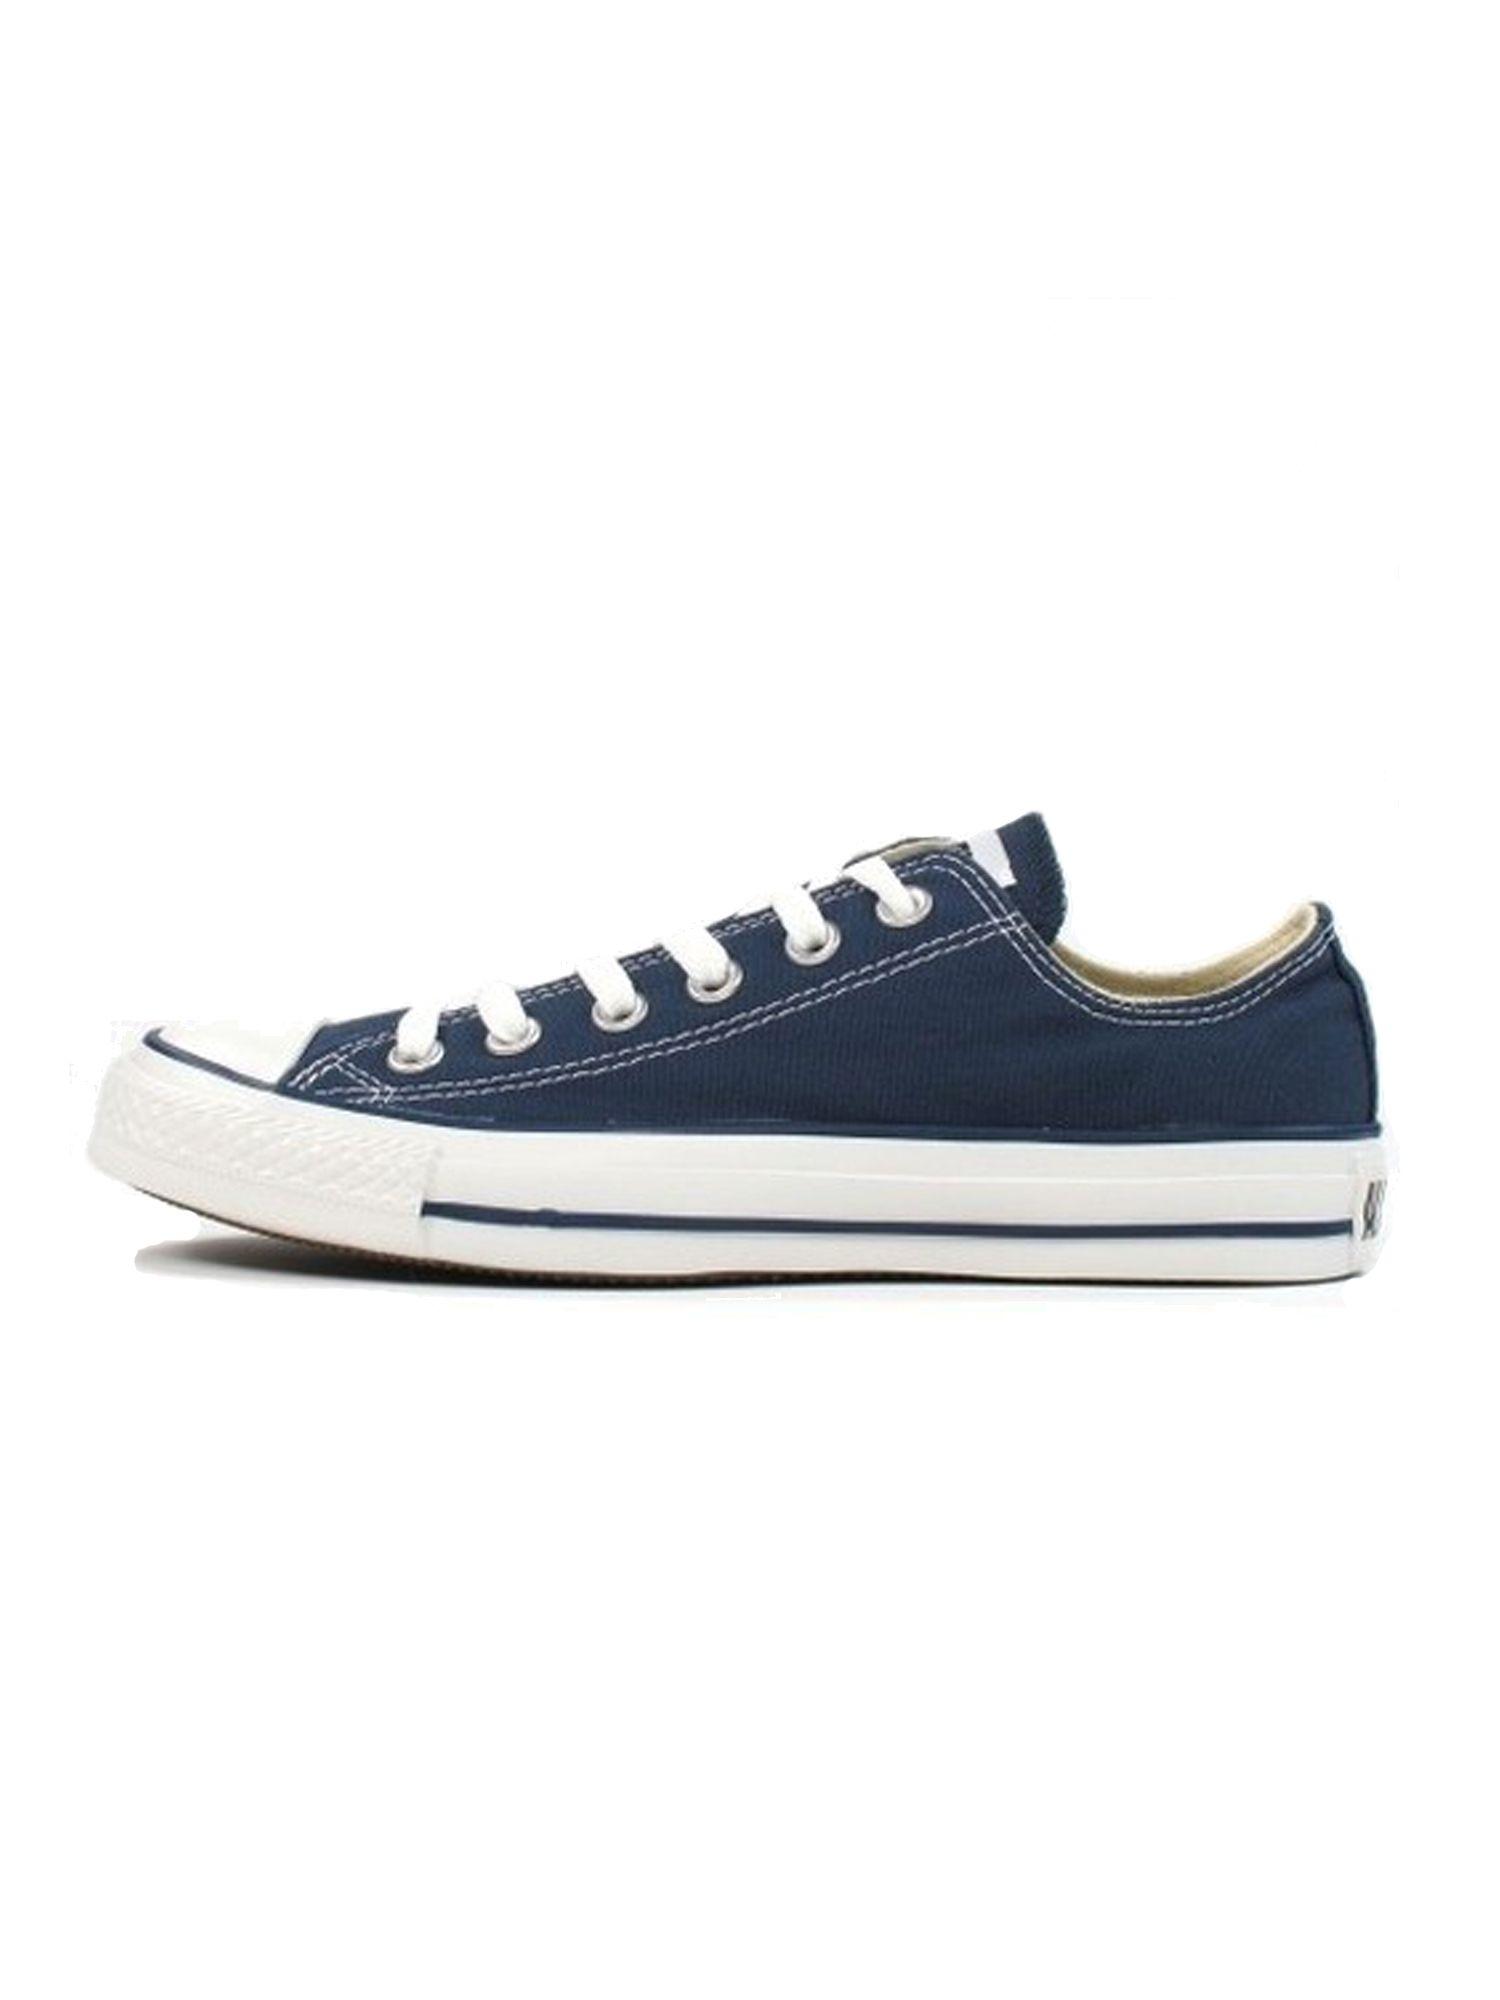 Converse Herren Schuhe All Star Ox Blau M9697C Sneakers Blau Gr. 42,5 | starlabels outdoor lifestyle leder